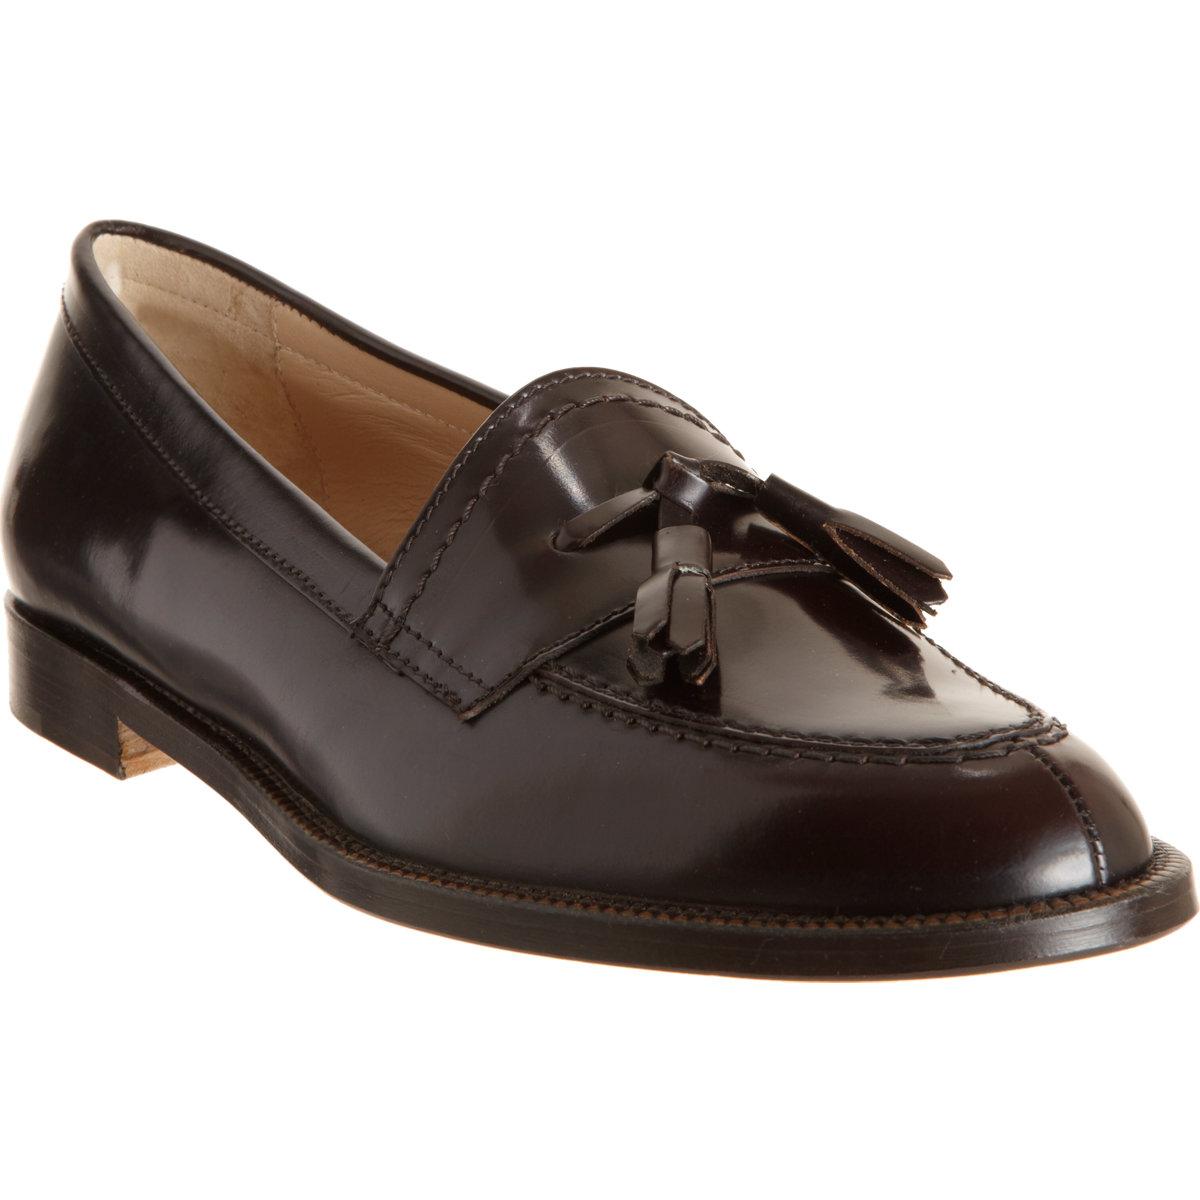 Lyst manolo blahnik aldena in brown for Shoes by manolo blahnik